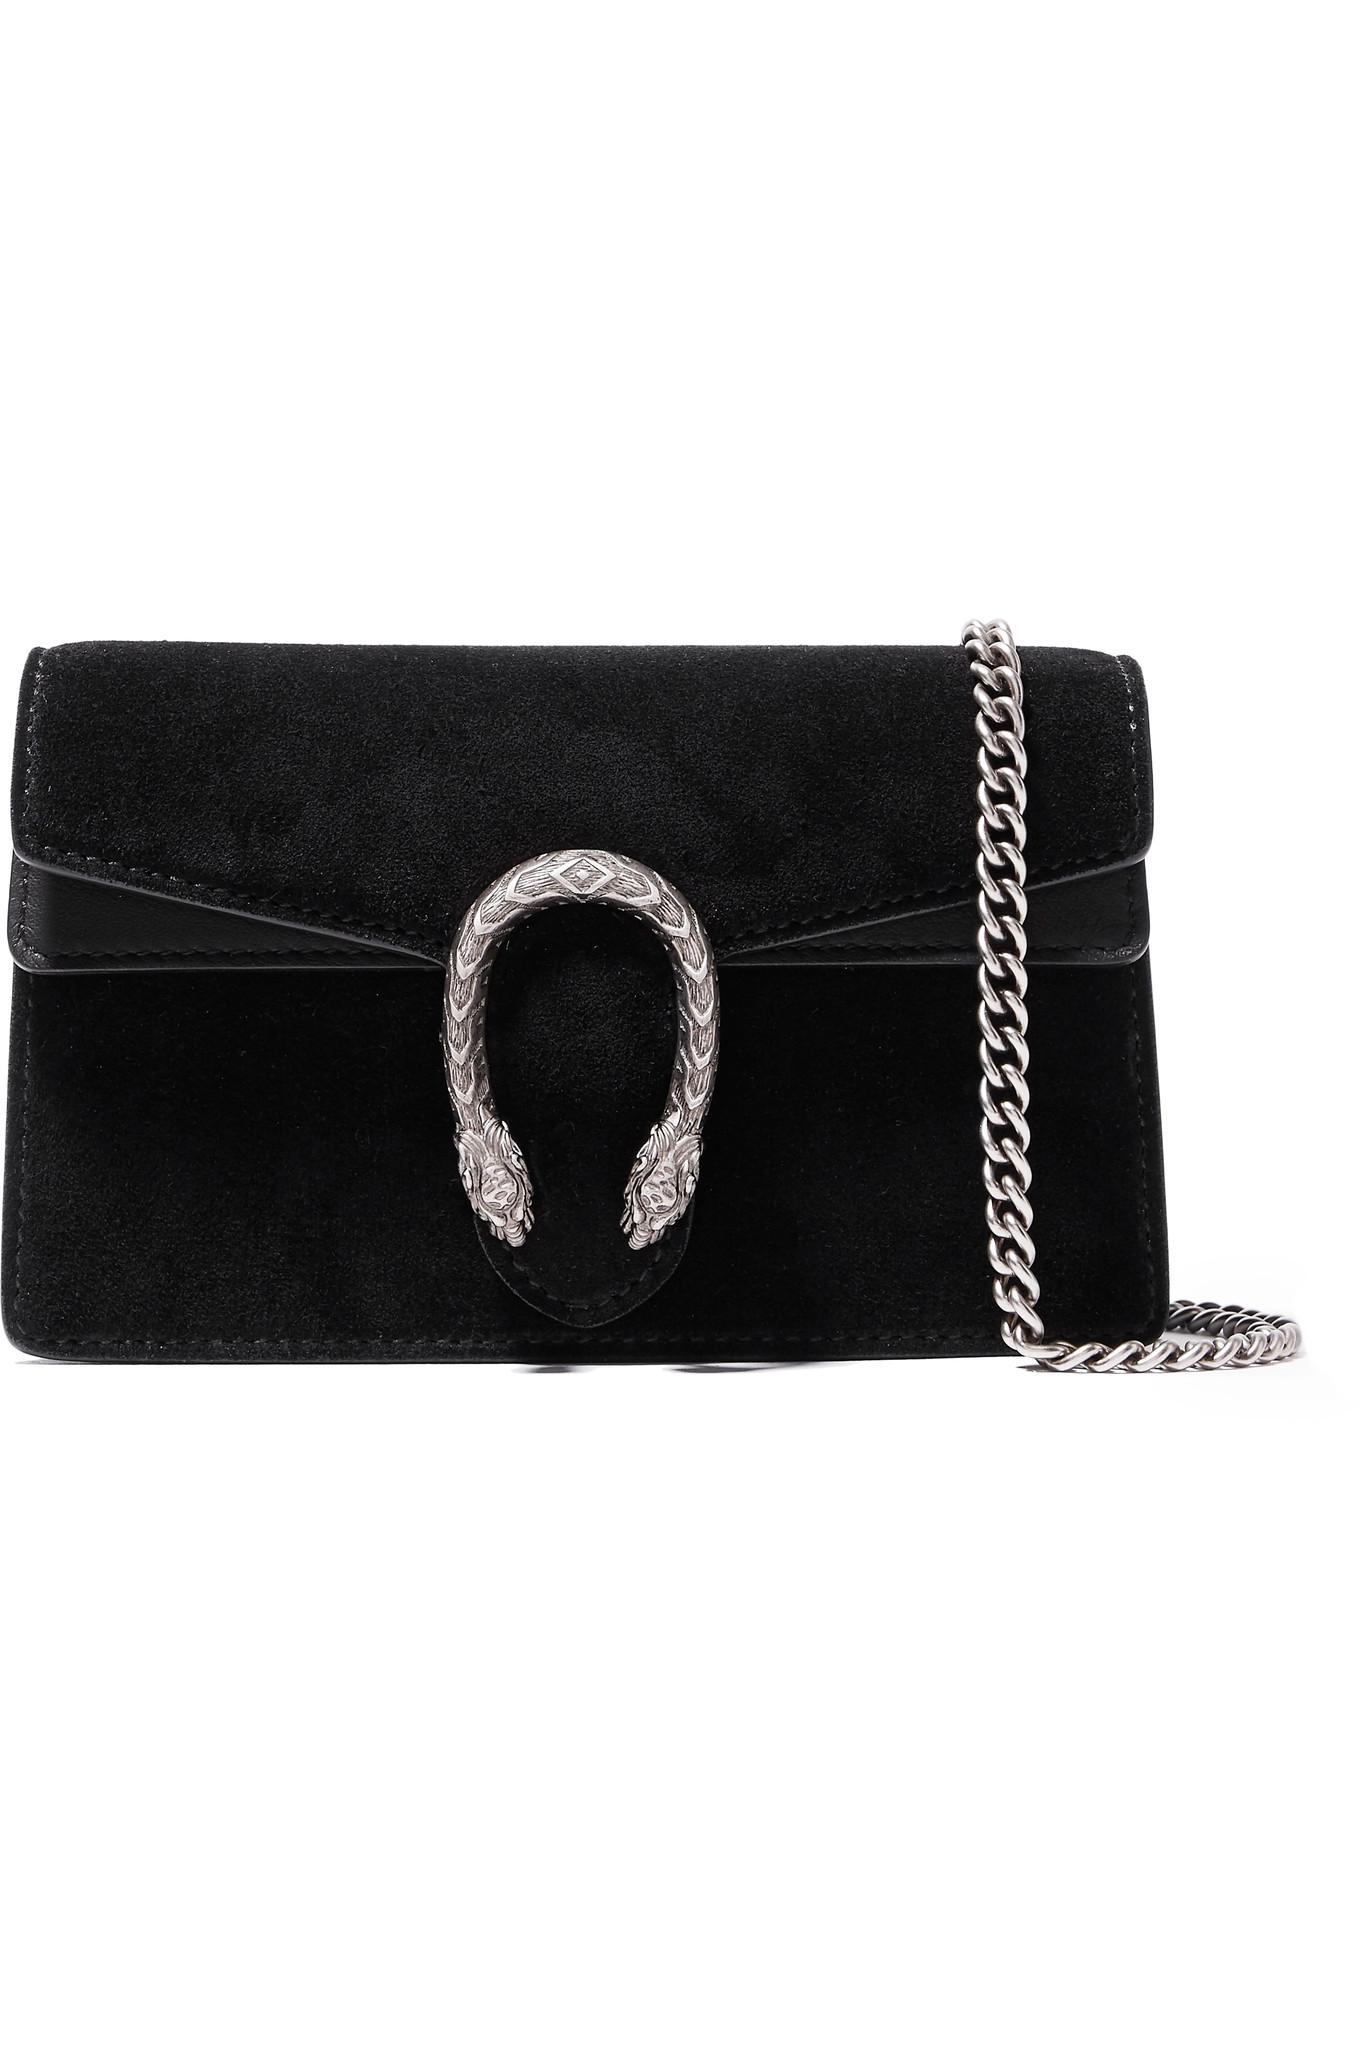 0cc04aafff39 Gucci Dionysus Super Mini Shoulder Bag in Black - Save 9% - Lyst